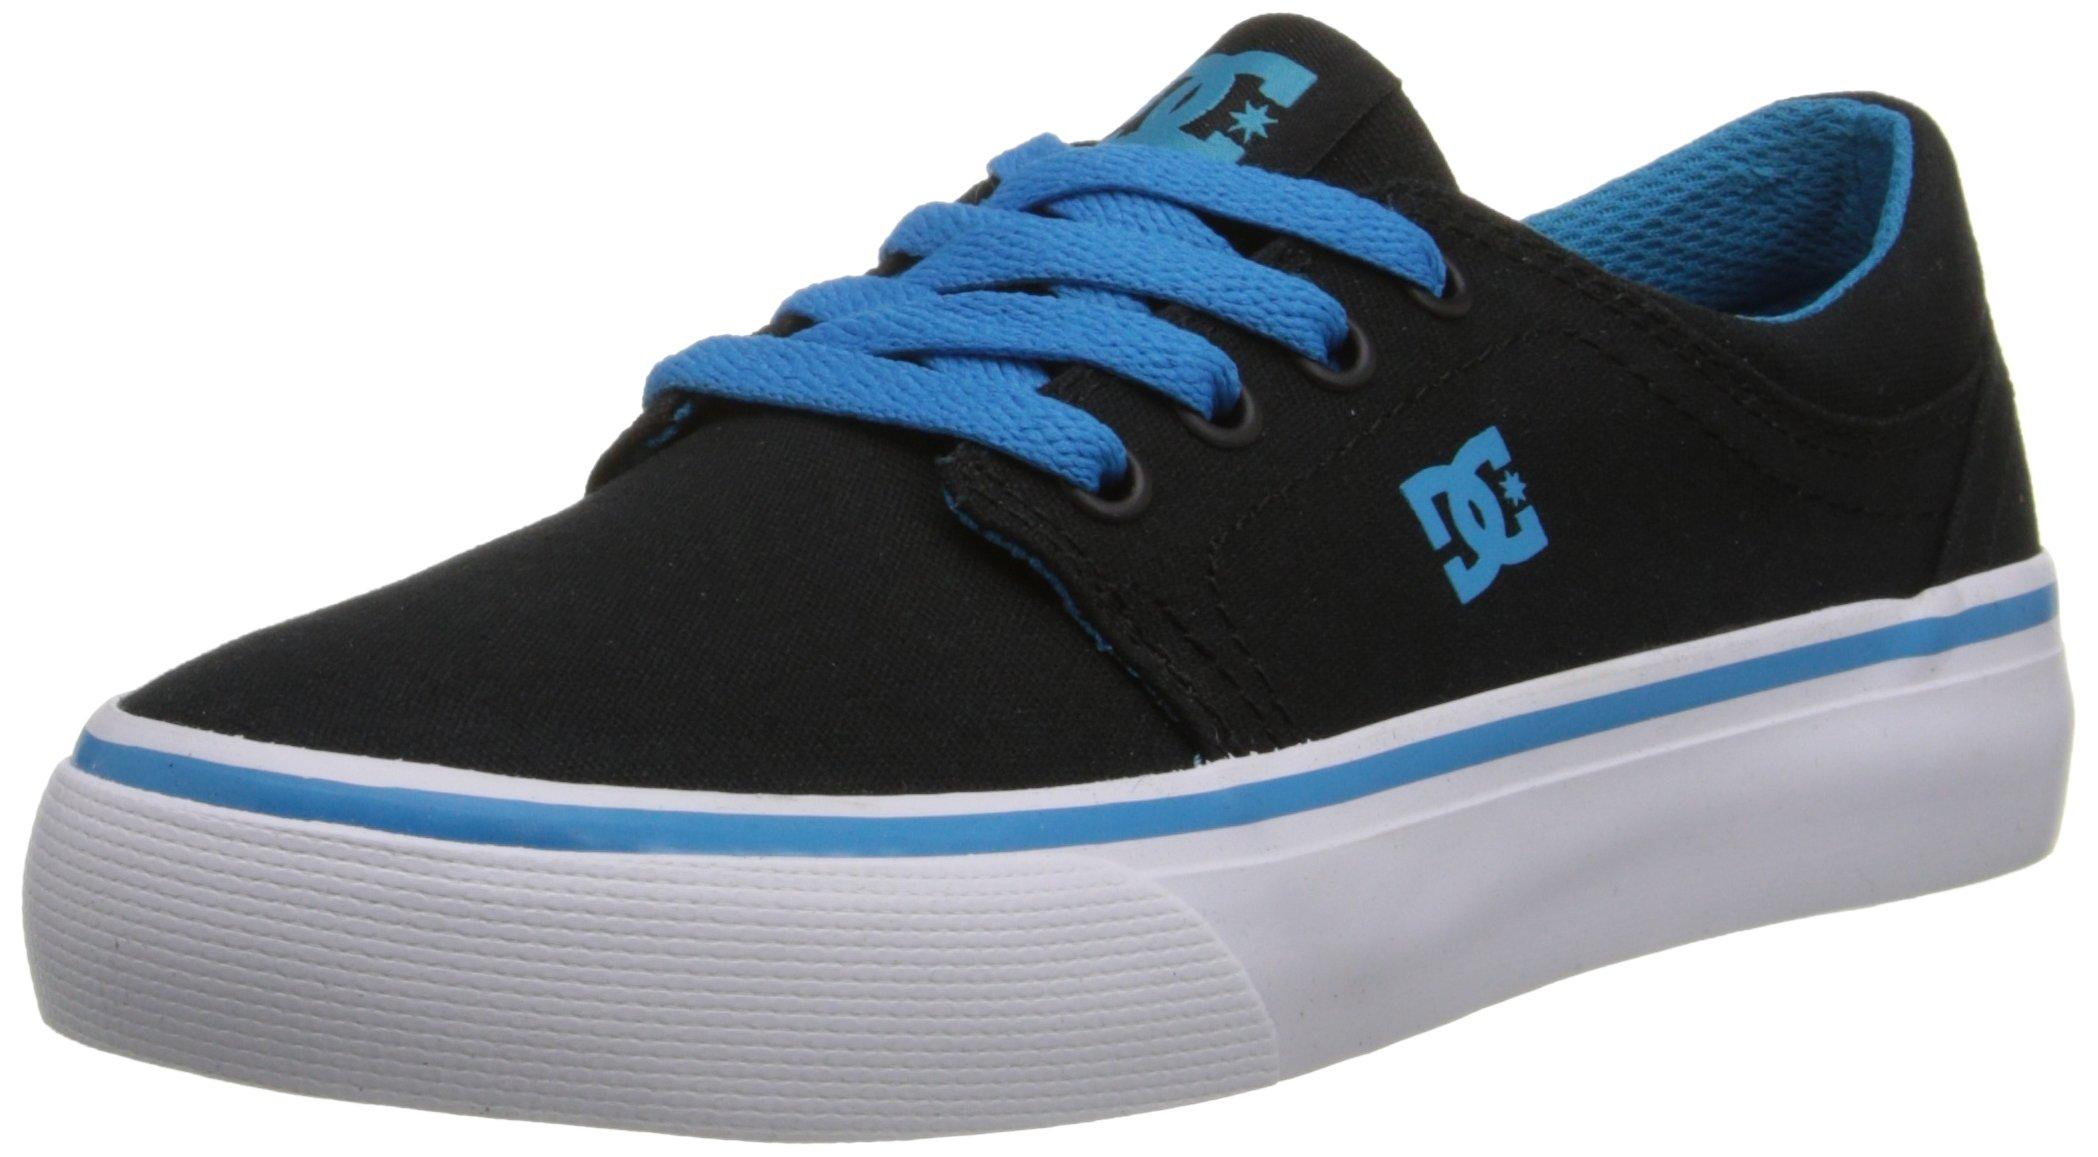 DC Trase TX Skate Shoe,Black/Turquoise,11.5 M US